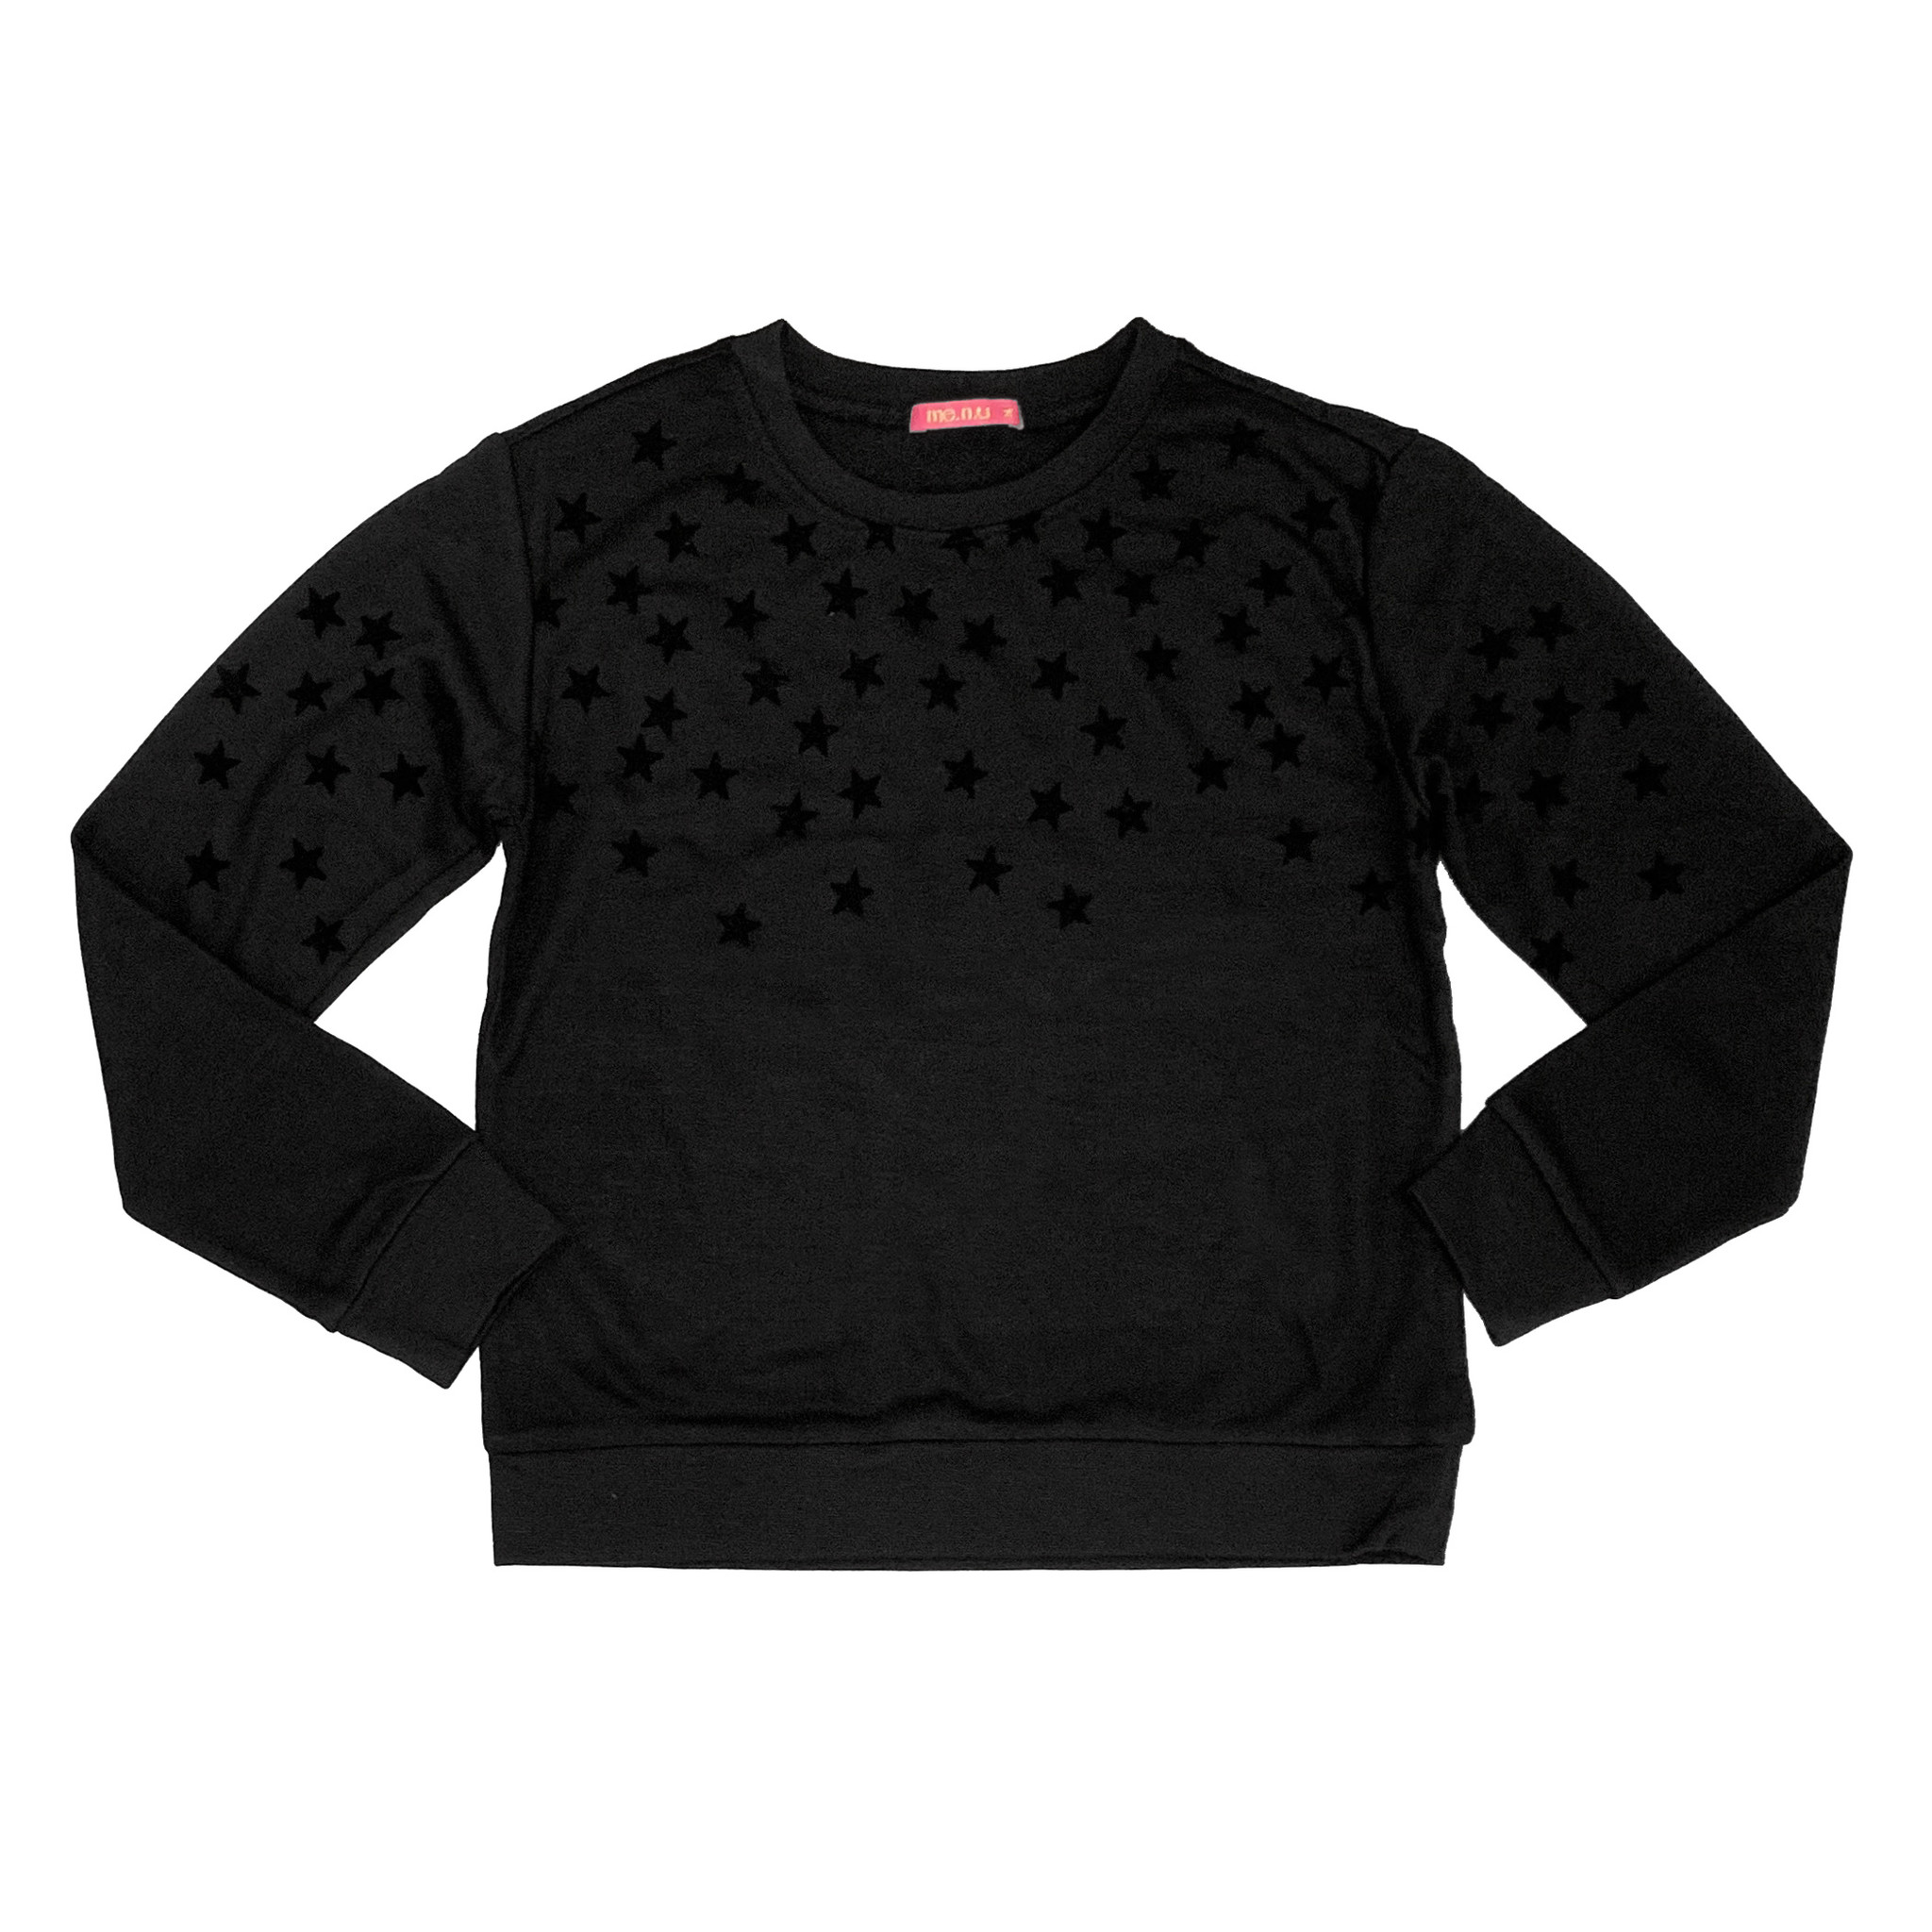 Me.N.U All Over Star Sweatshirt